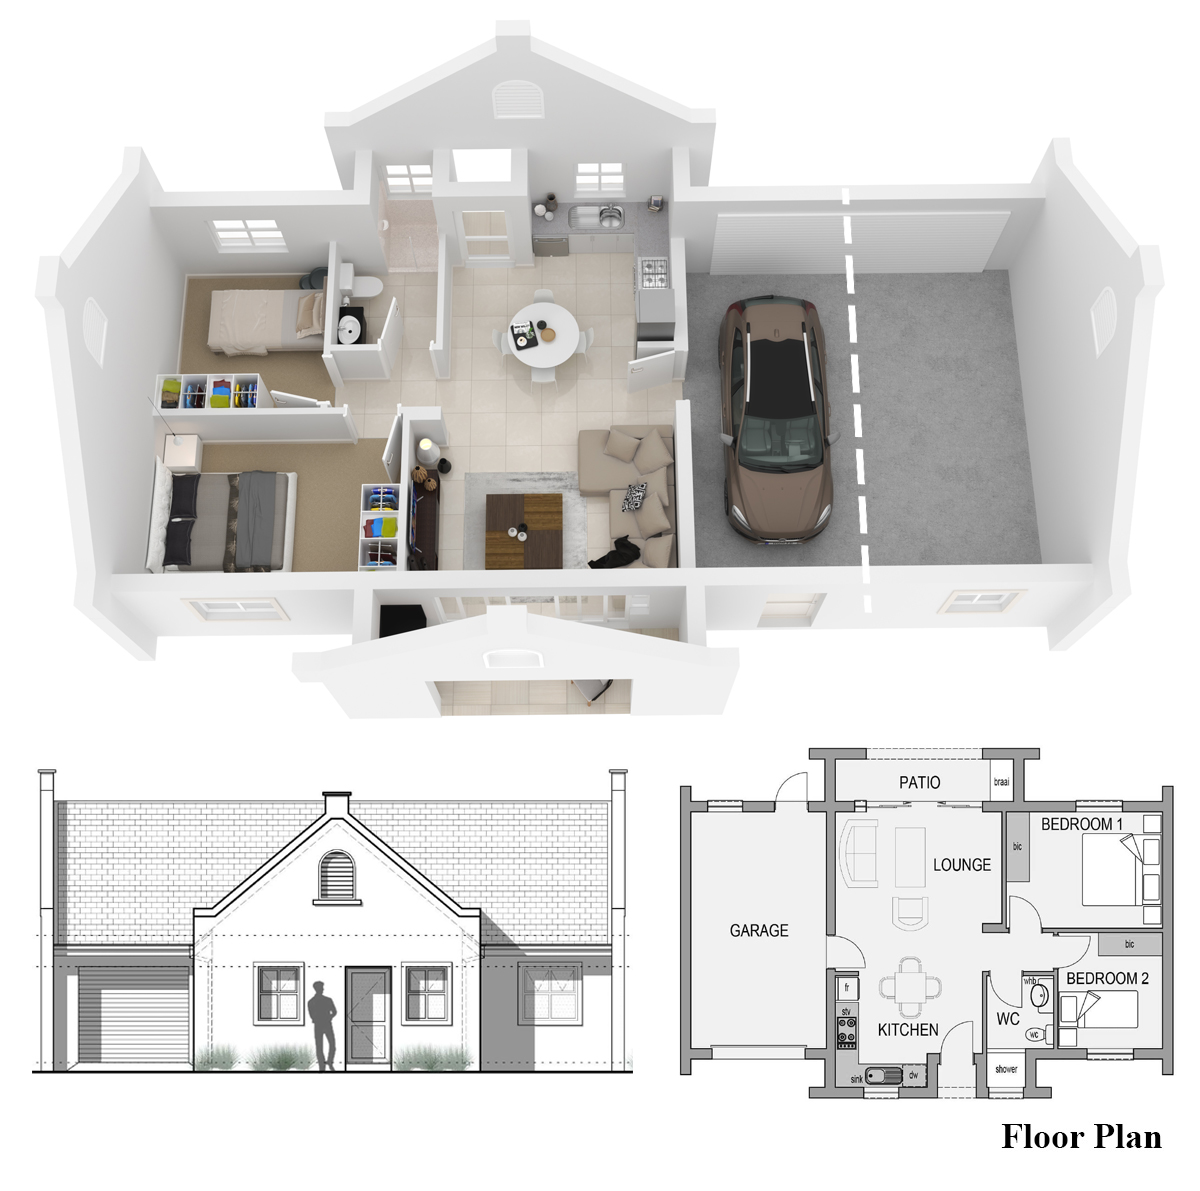 zevenwacht-lifestyle-estate-retirement-home-type-g1-1200x1191